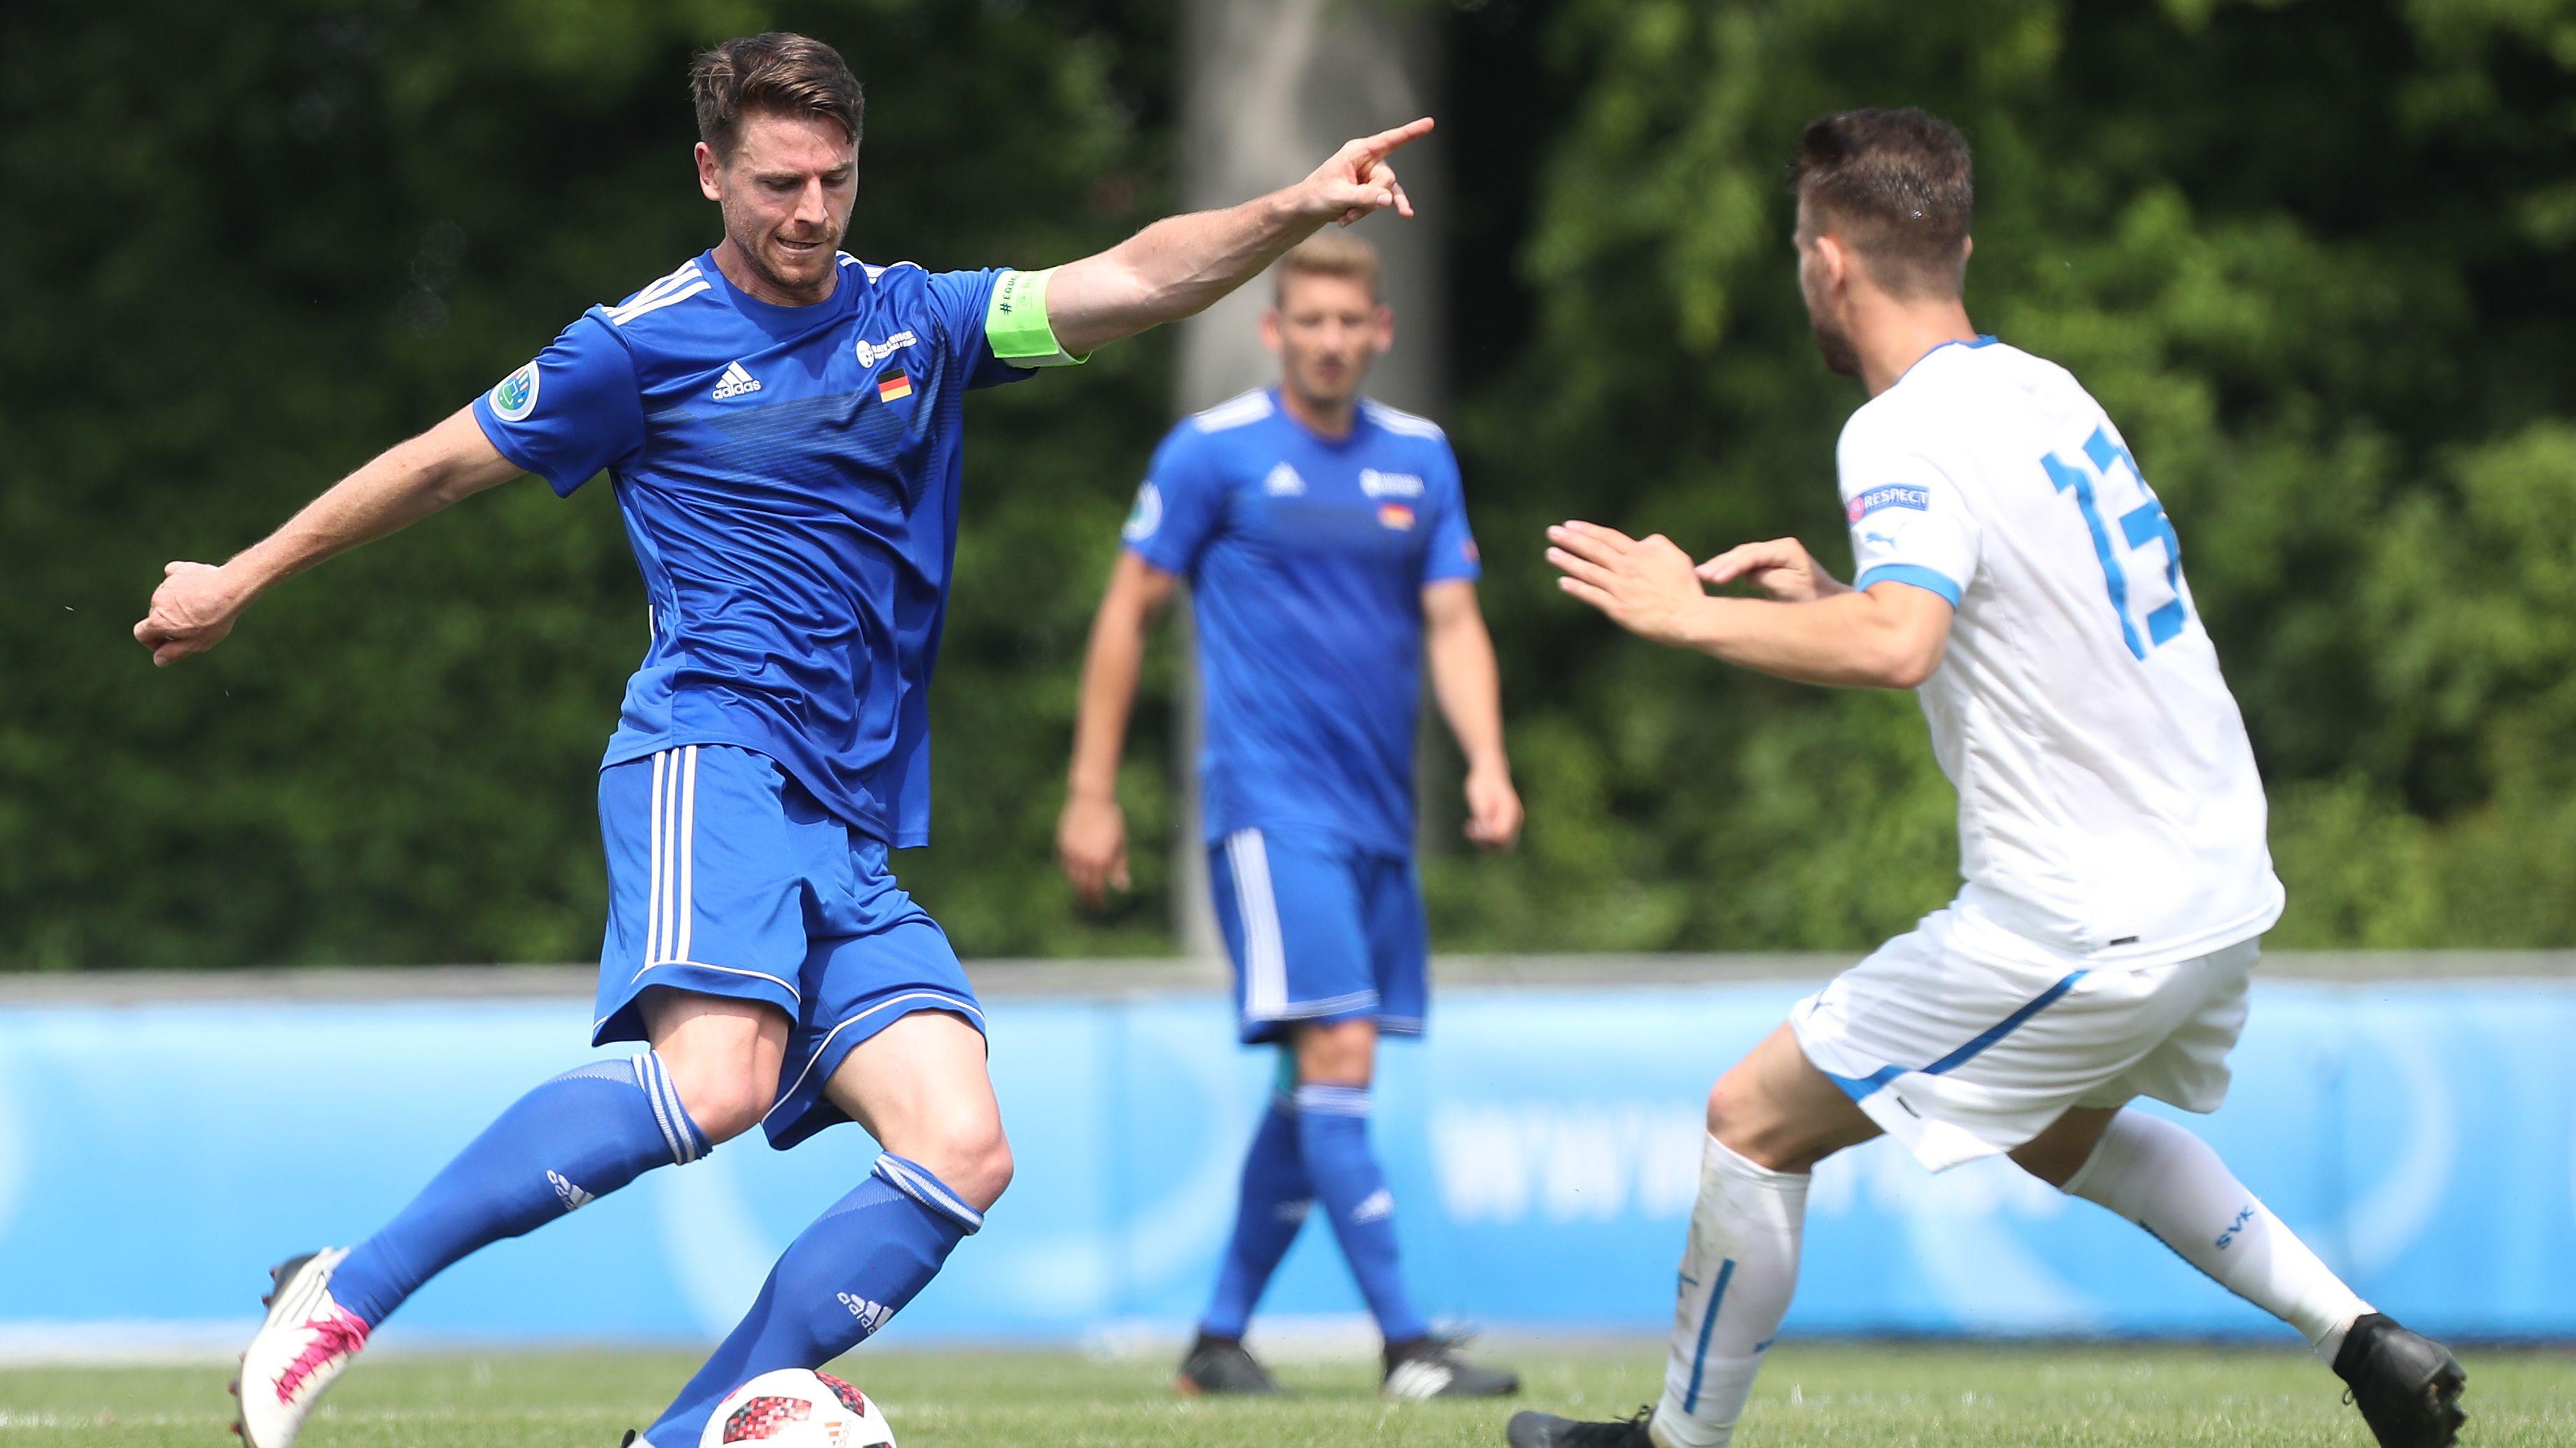 UEFA Regions Cup: Spielszene Bayern - Westslowakei